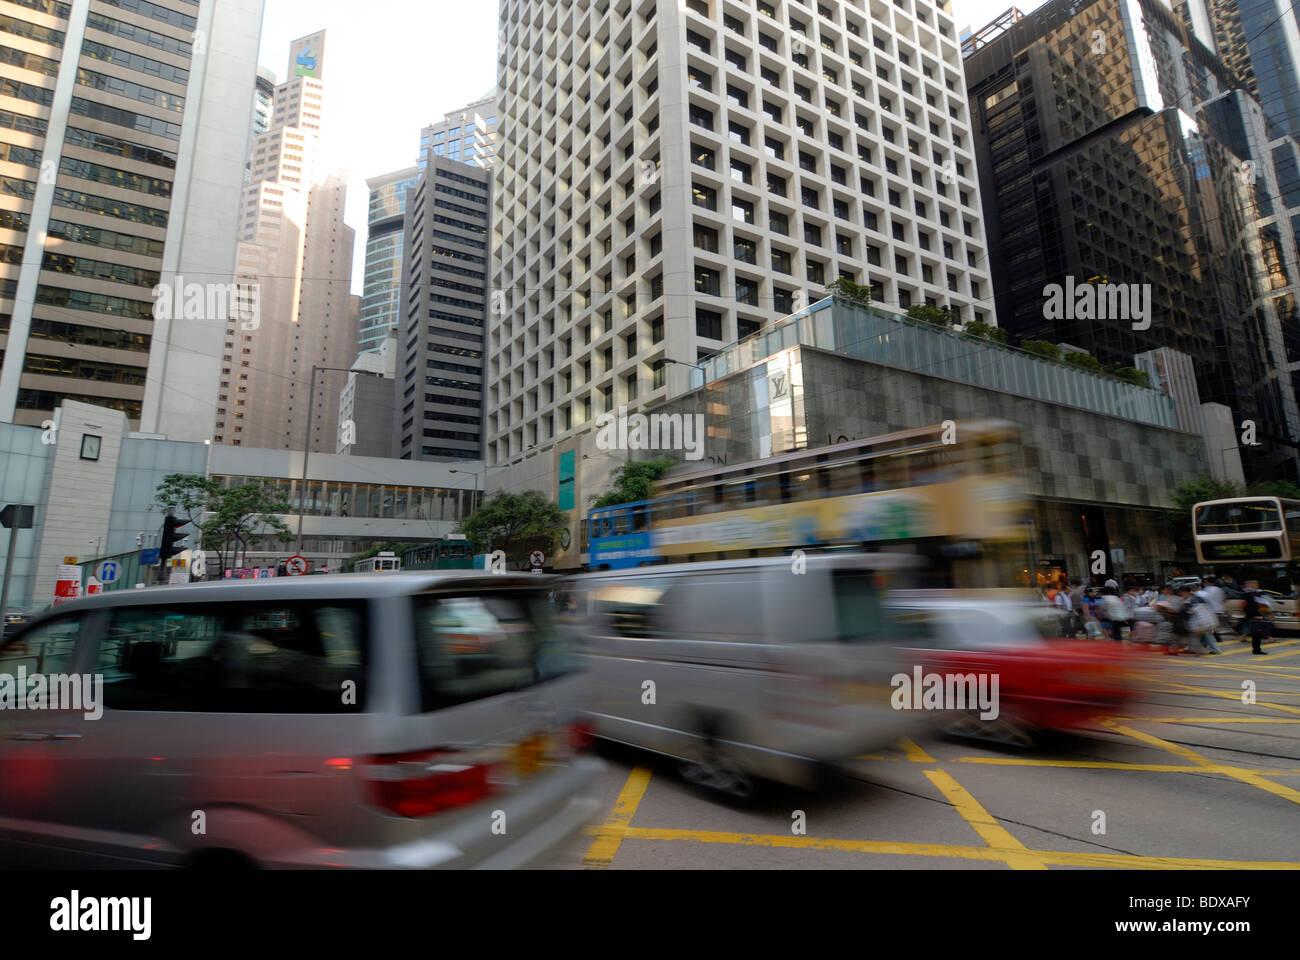 Dense traffic in the narrow streets of Hong Kong between skyscrapers, in Central, Hong Kong, China, Asia - Stock Image